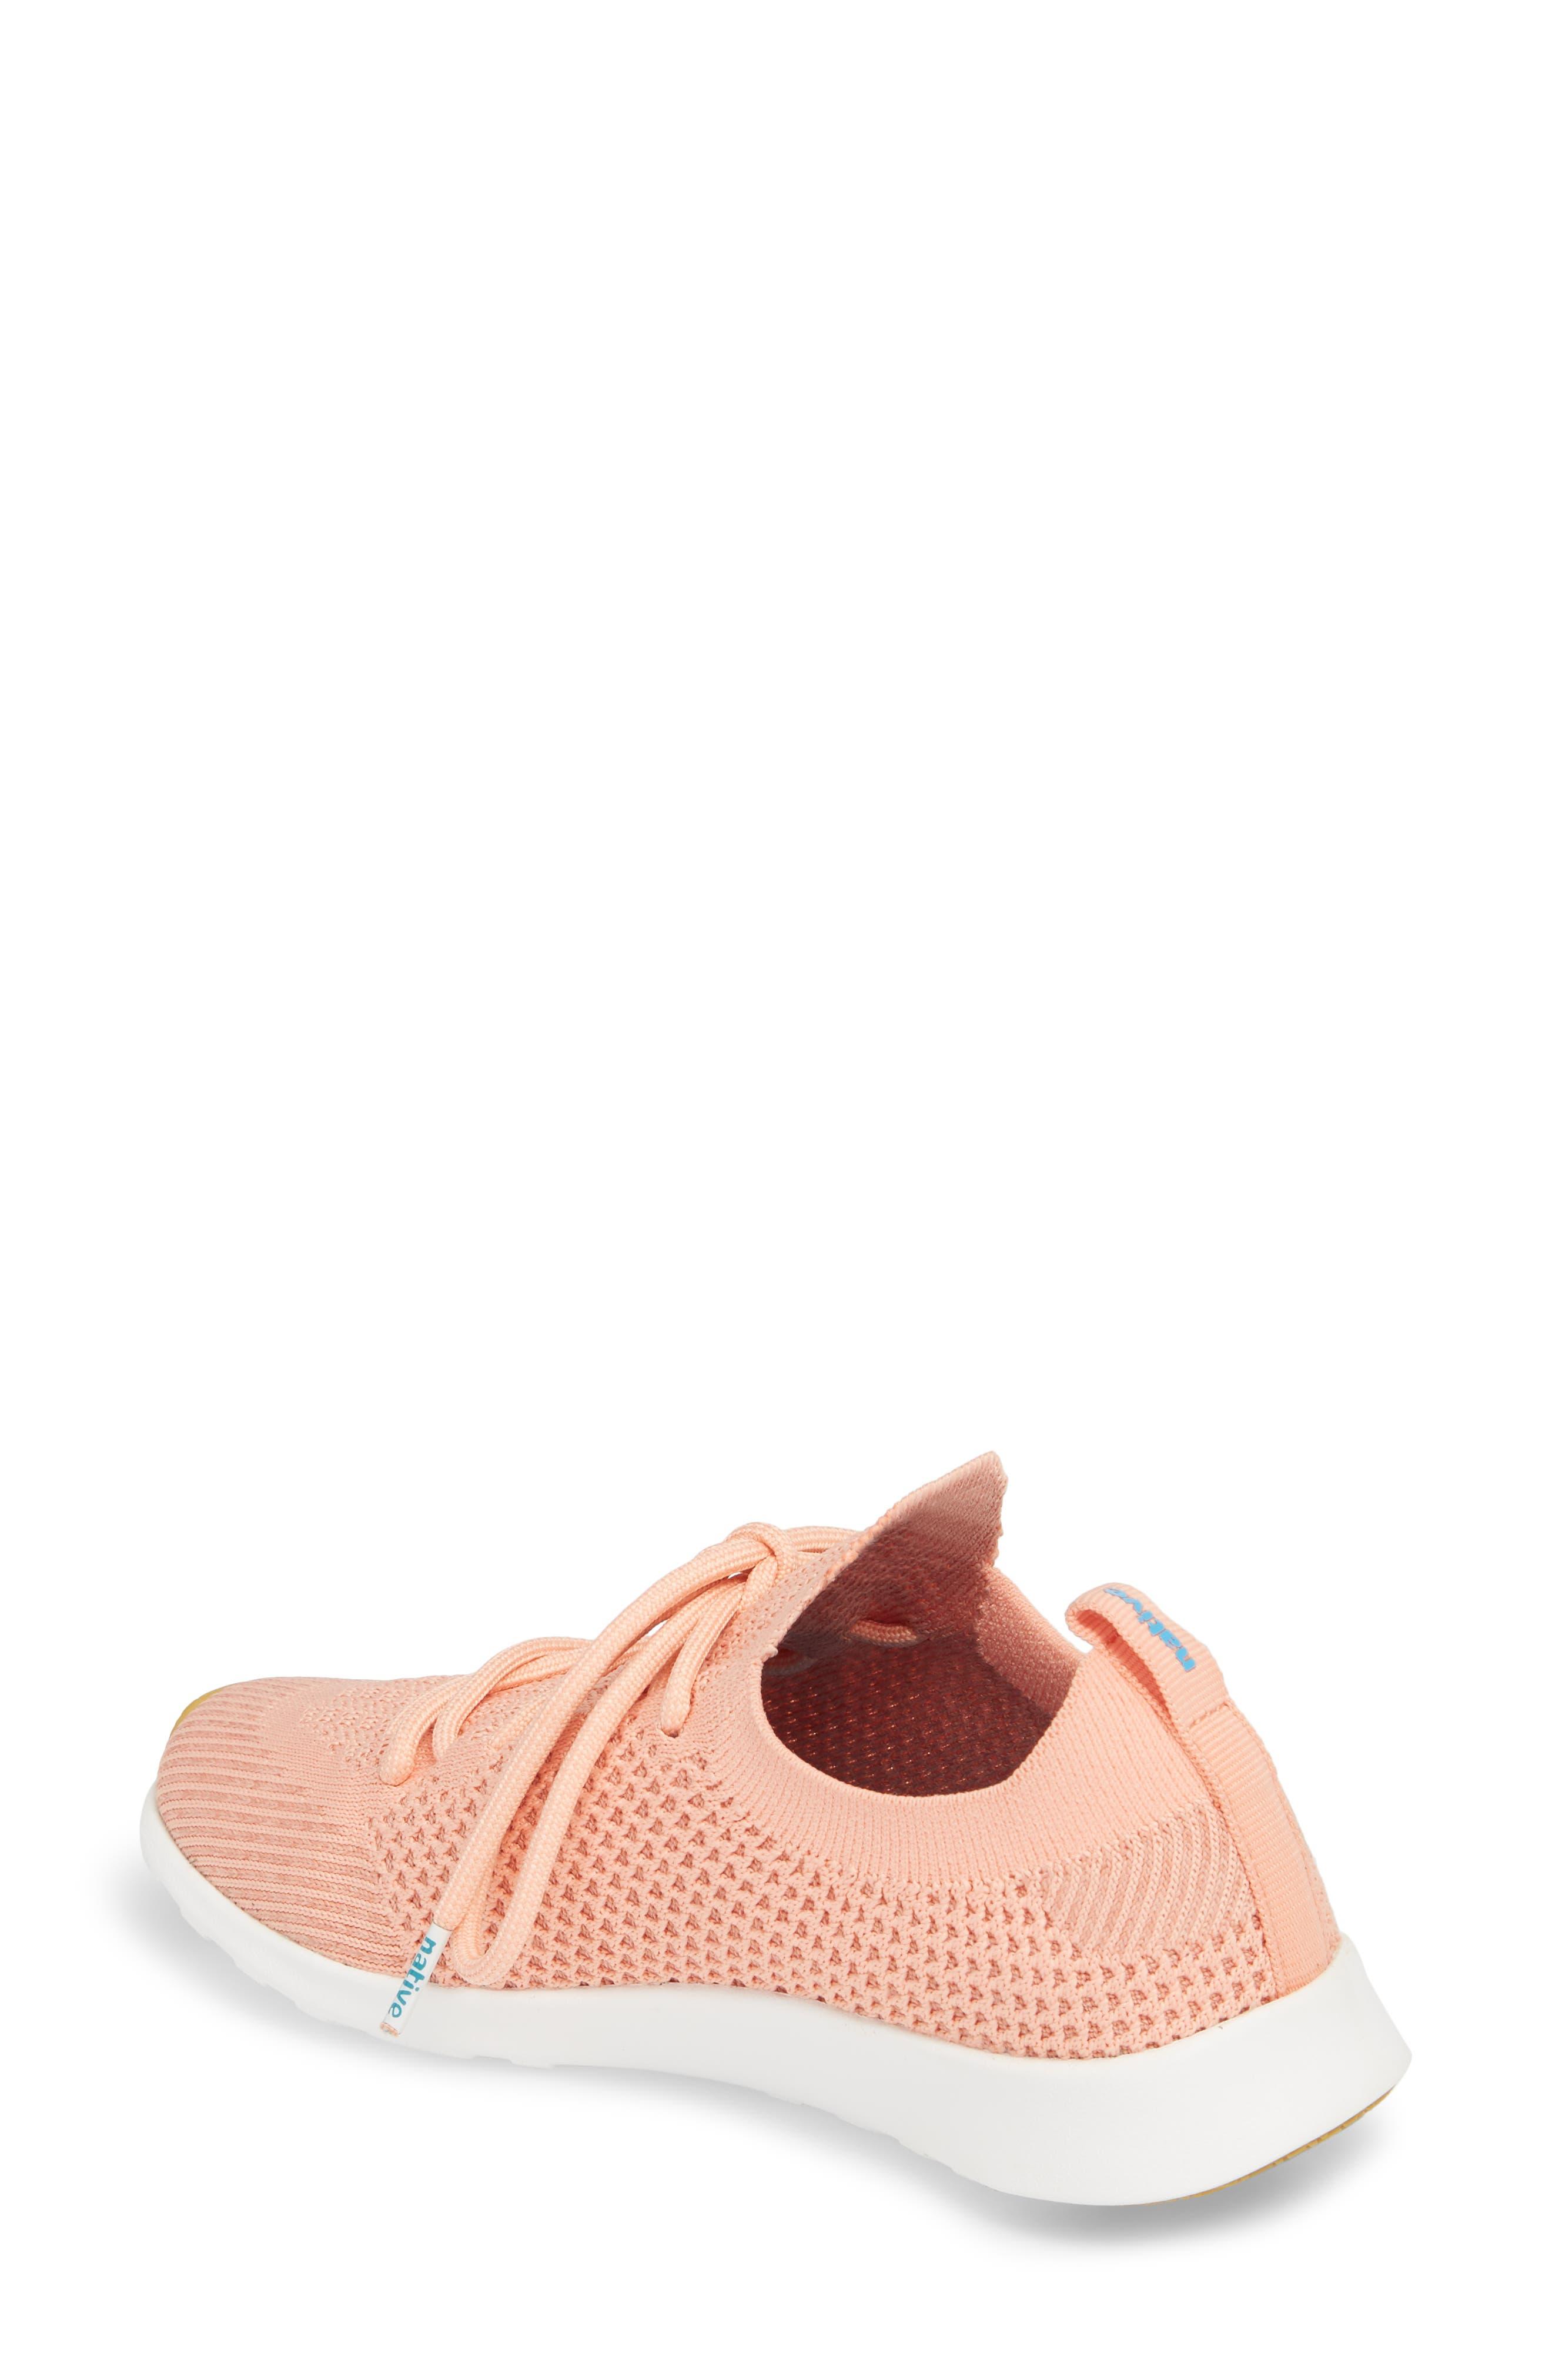 AP Mercury Liteknit Sneaker,                             Alternate thumbnail 2, color,                             Clay Pink/ Shell White